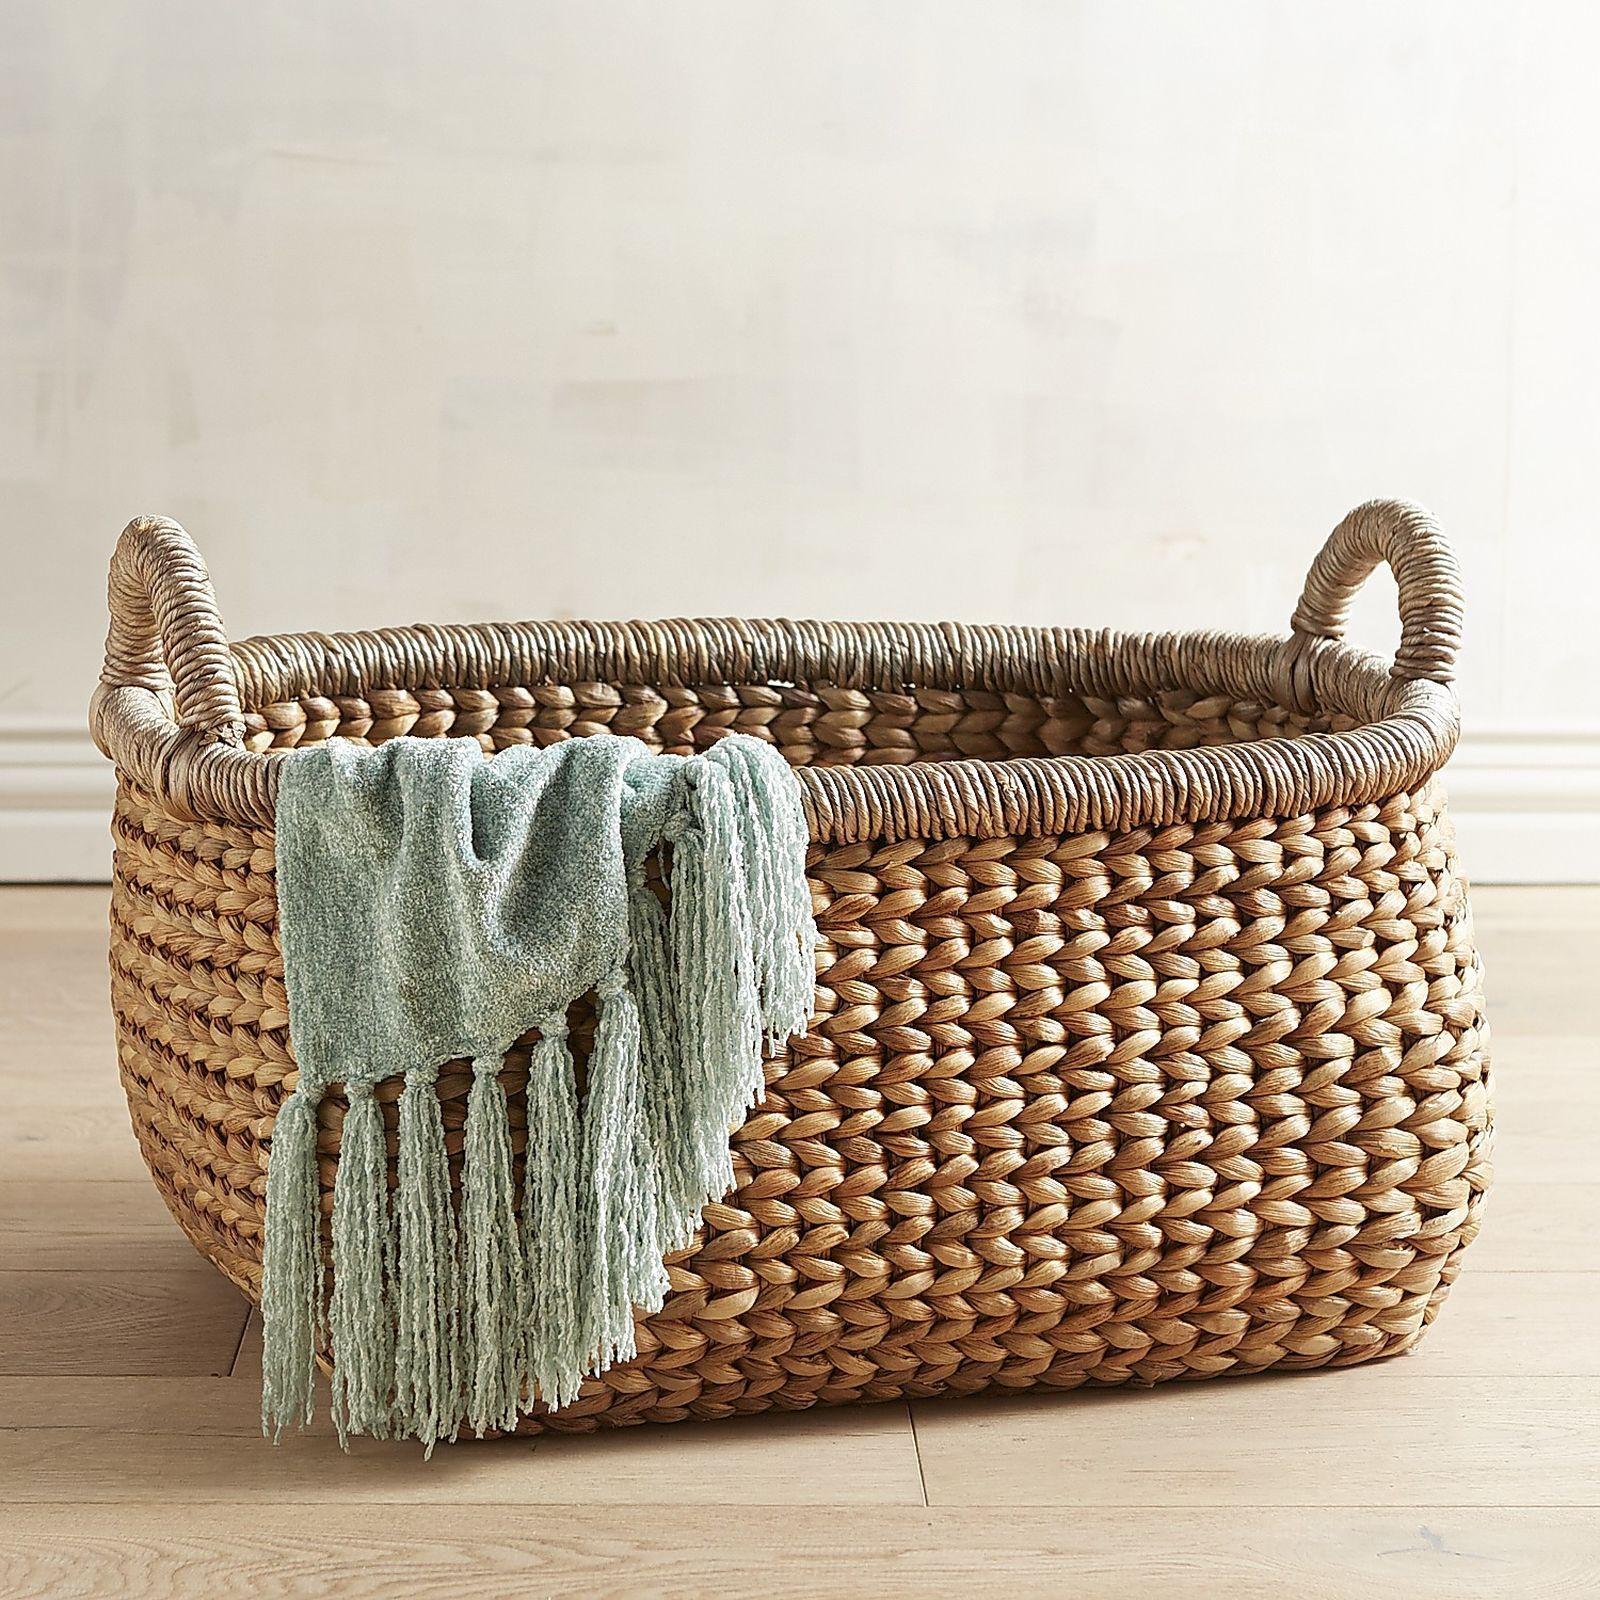 Large Wicker Baskets For Easter Wicker Large Baskets Rectangular Baskets